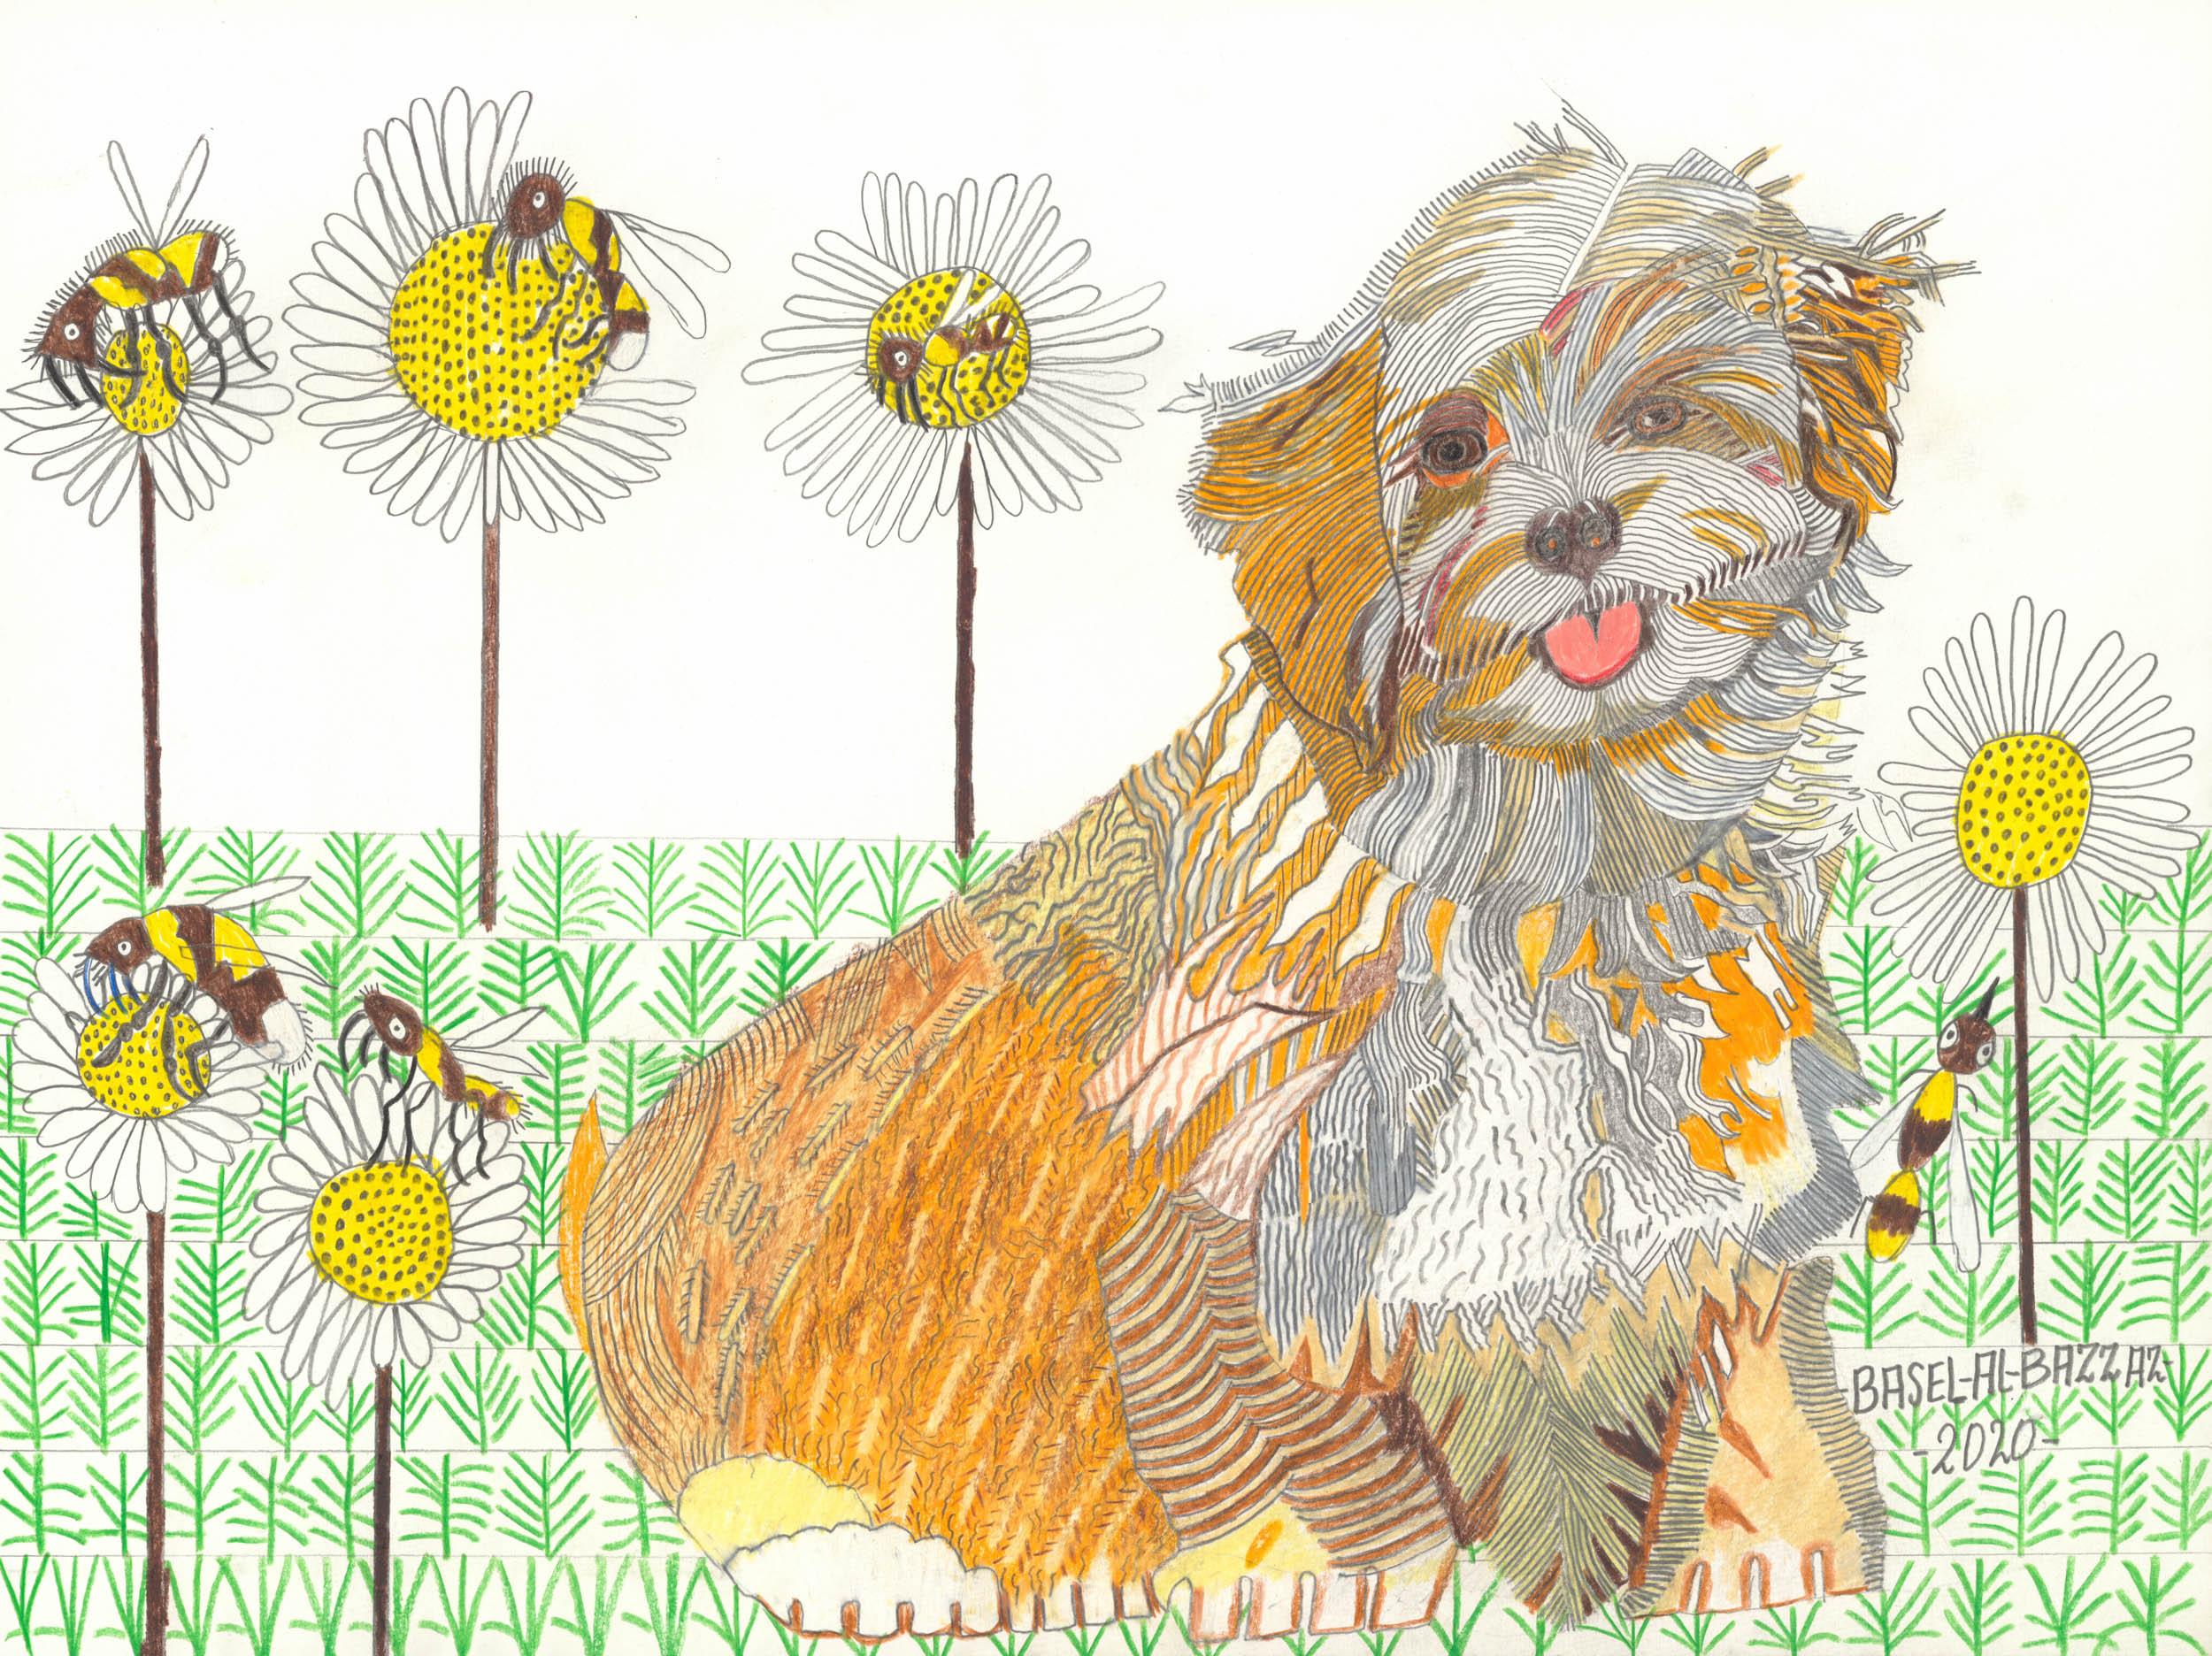 al-bazzaz basel - Hund in der Frühlingswiese / Dog in the spring meadow